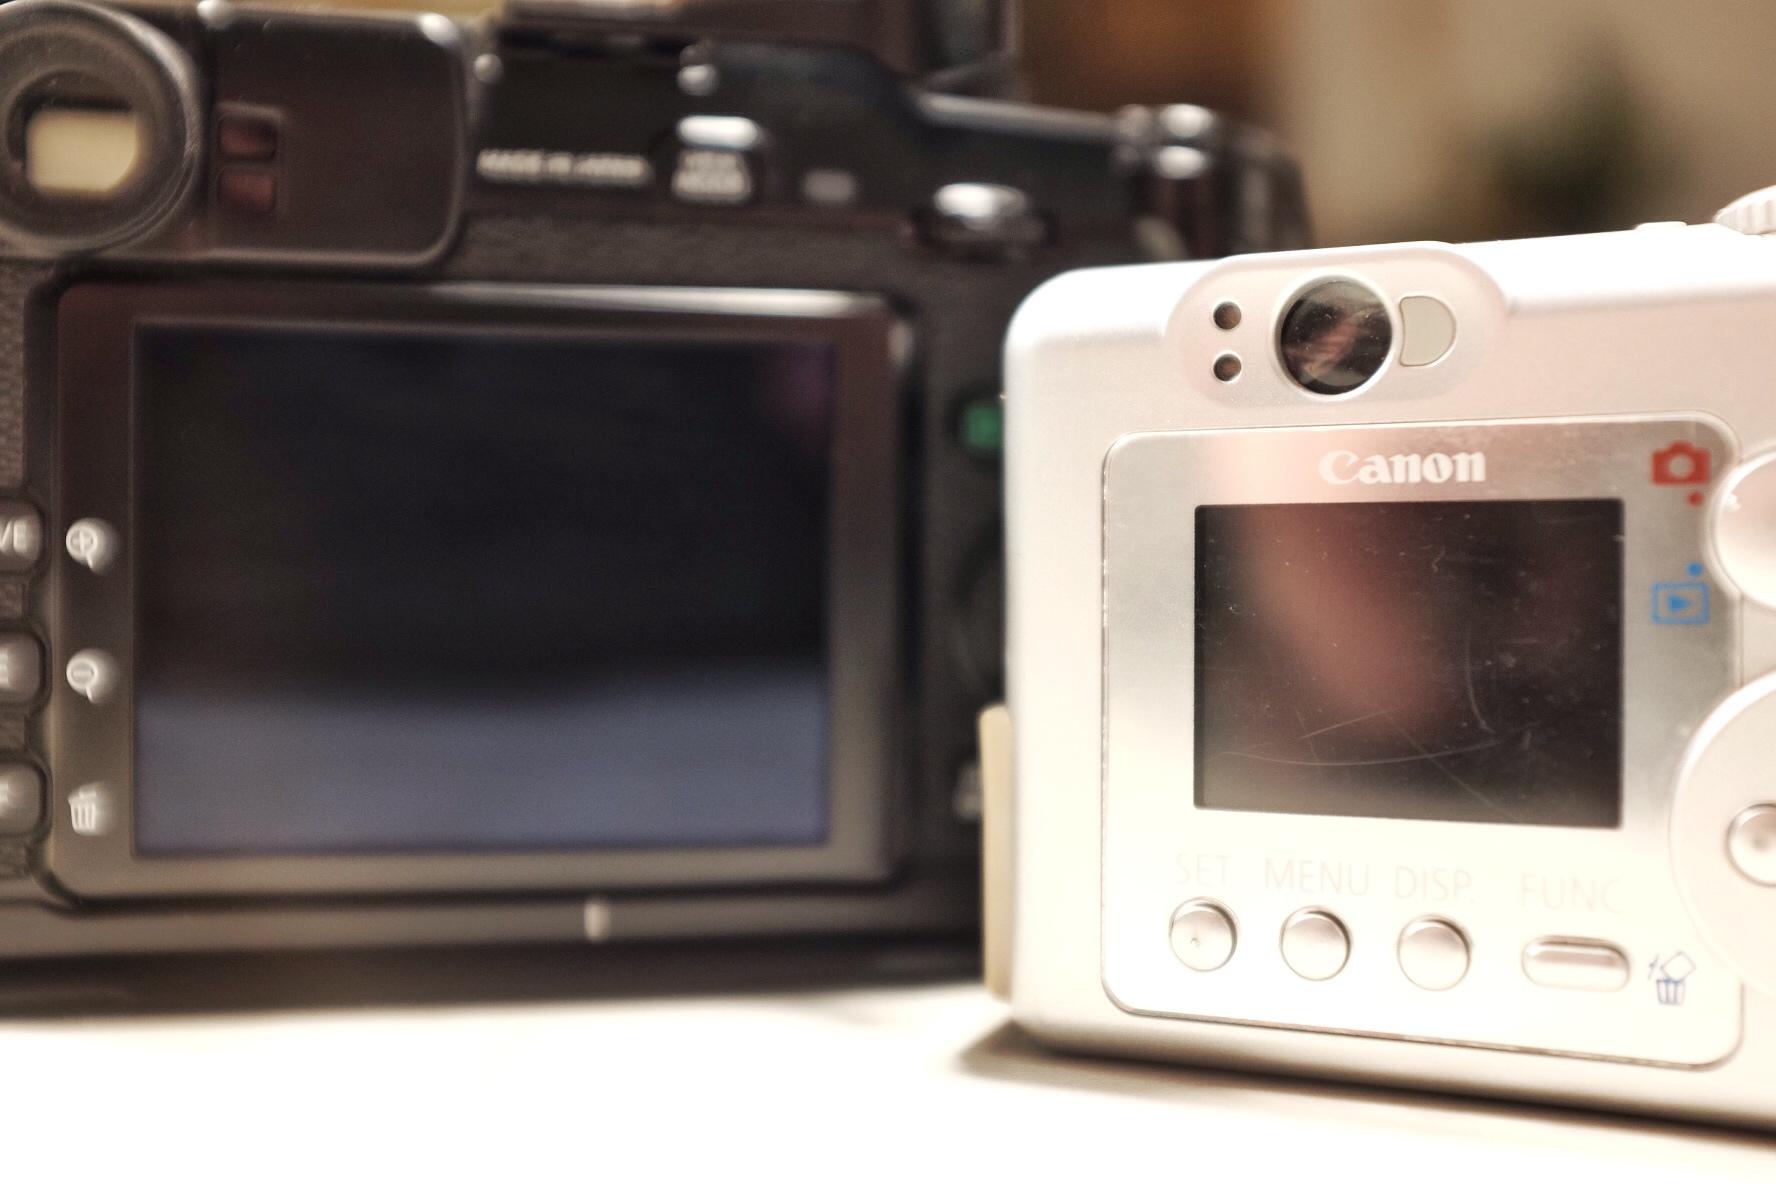 "Links die Fujifilm X-Pro1 mit 3"" Display, rechts die Canon PowerShot A70 mit 1,5"" Display"